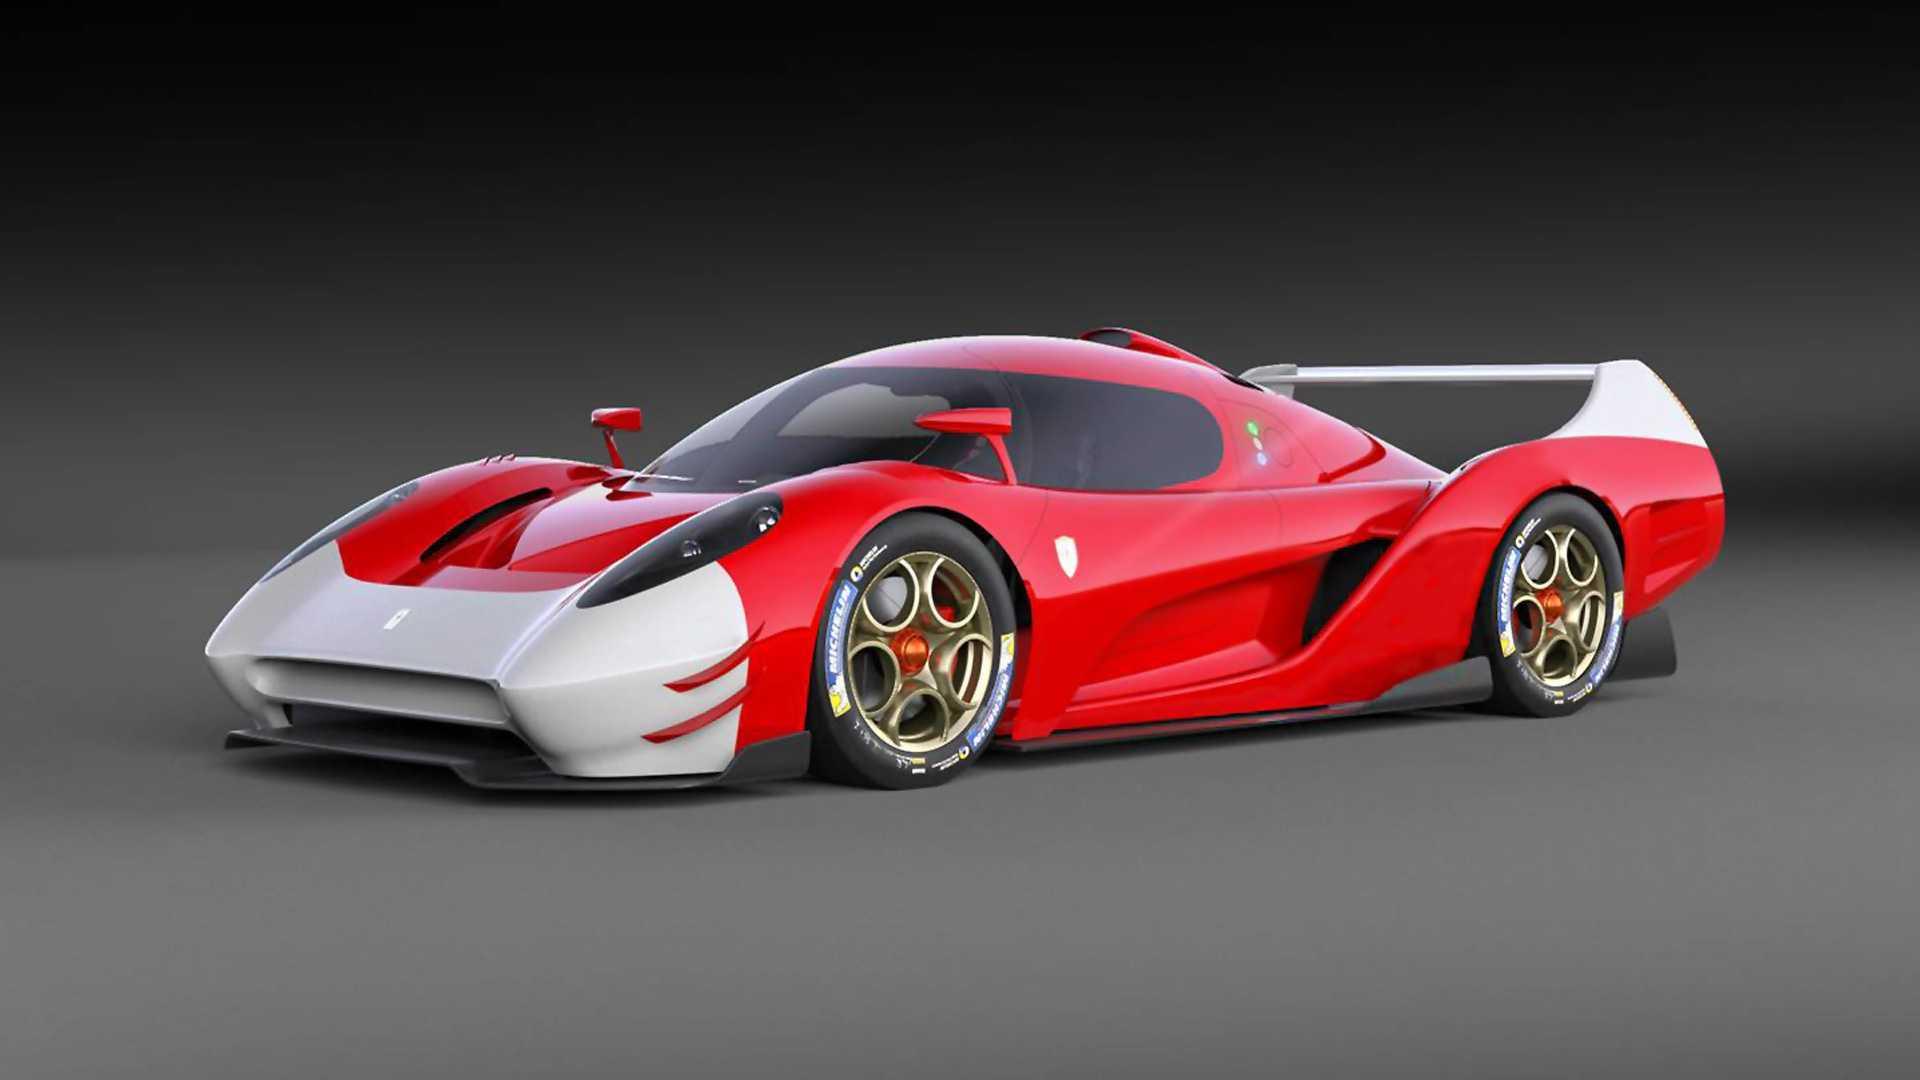 Scuderia Cameron Glickenhaus Reveals Updated SCG 007 LMP Hypercar